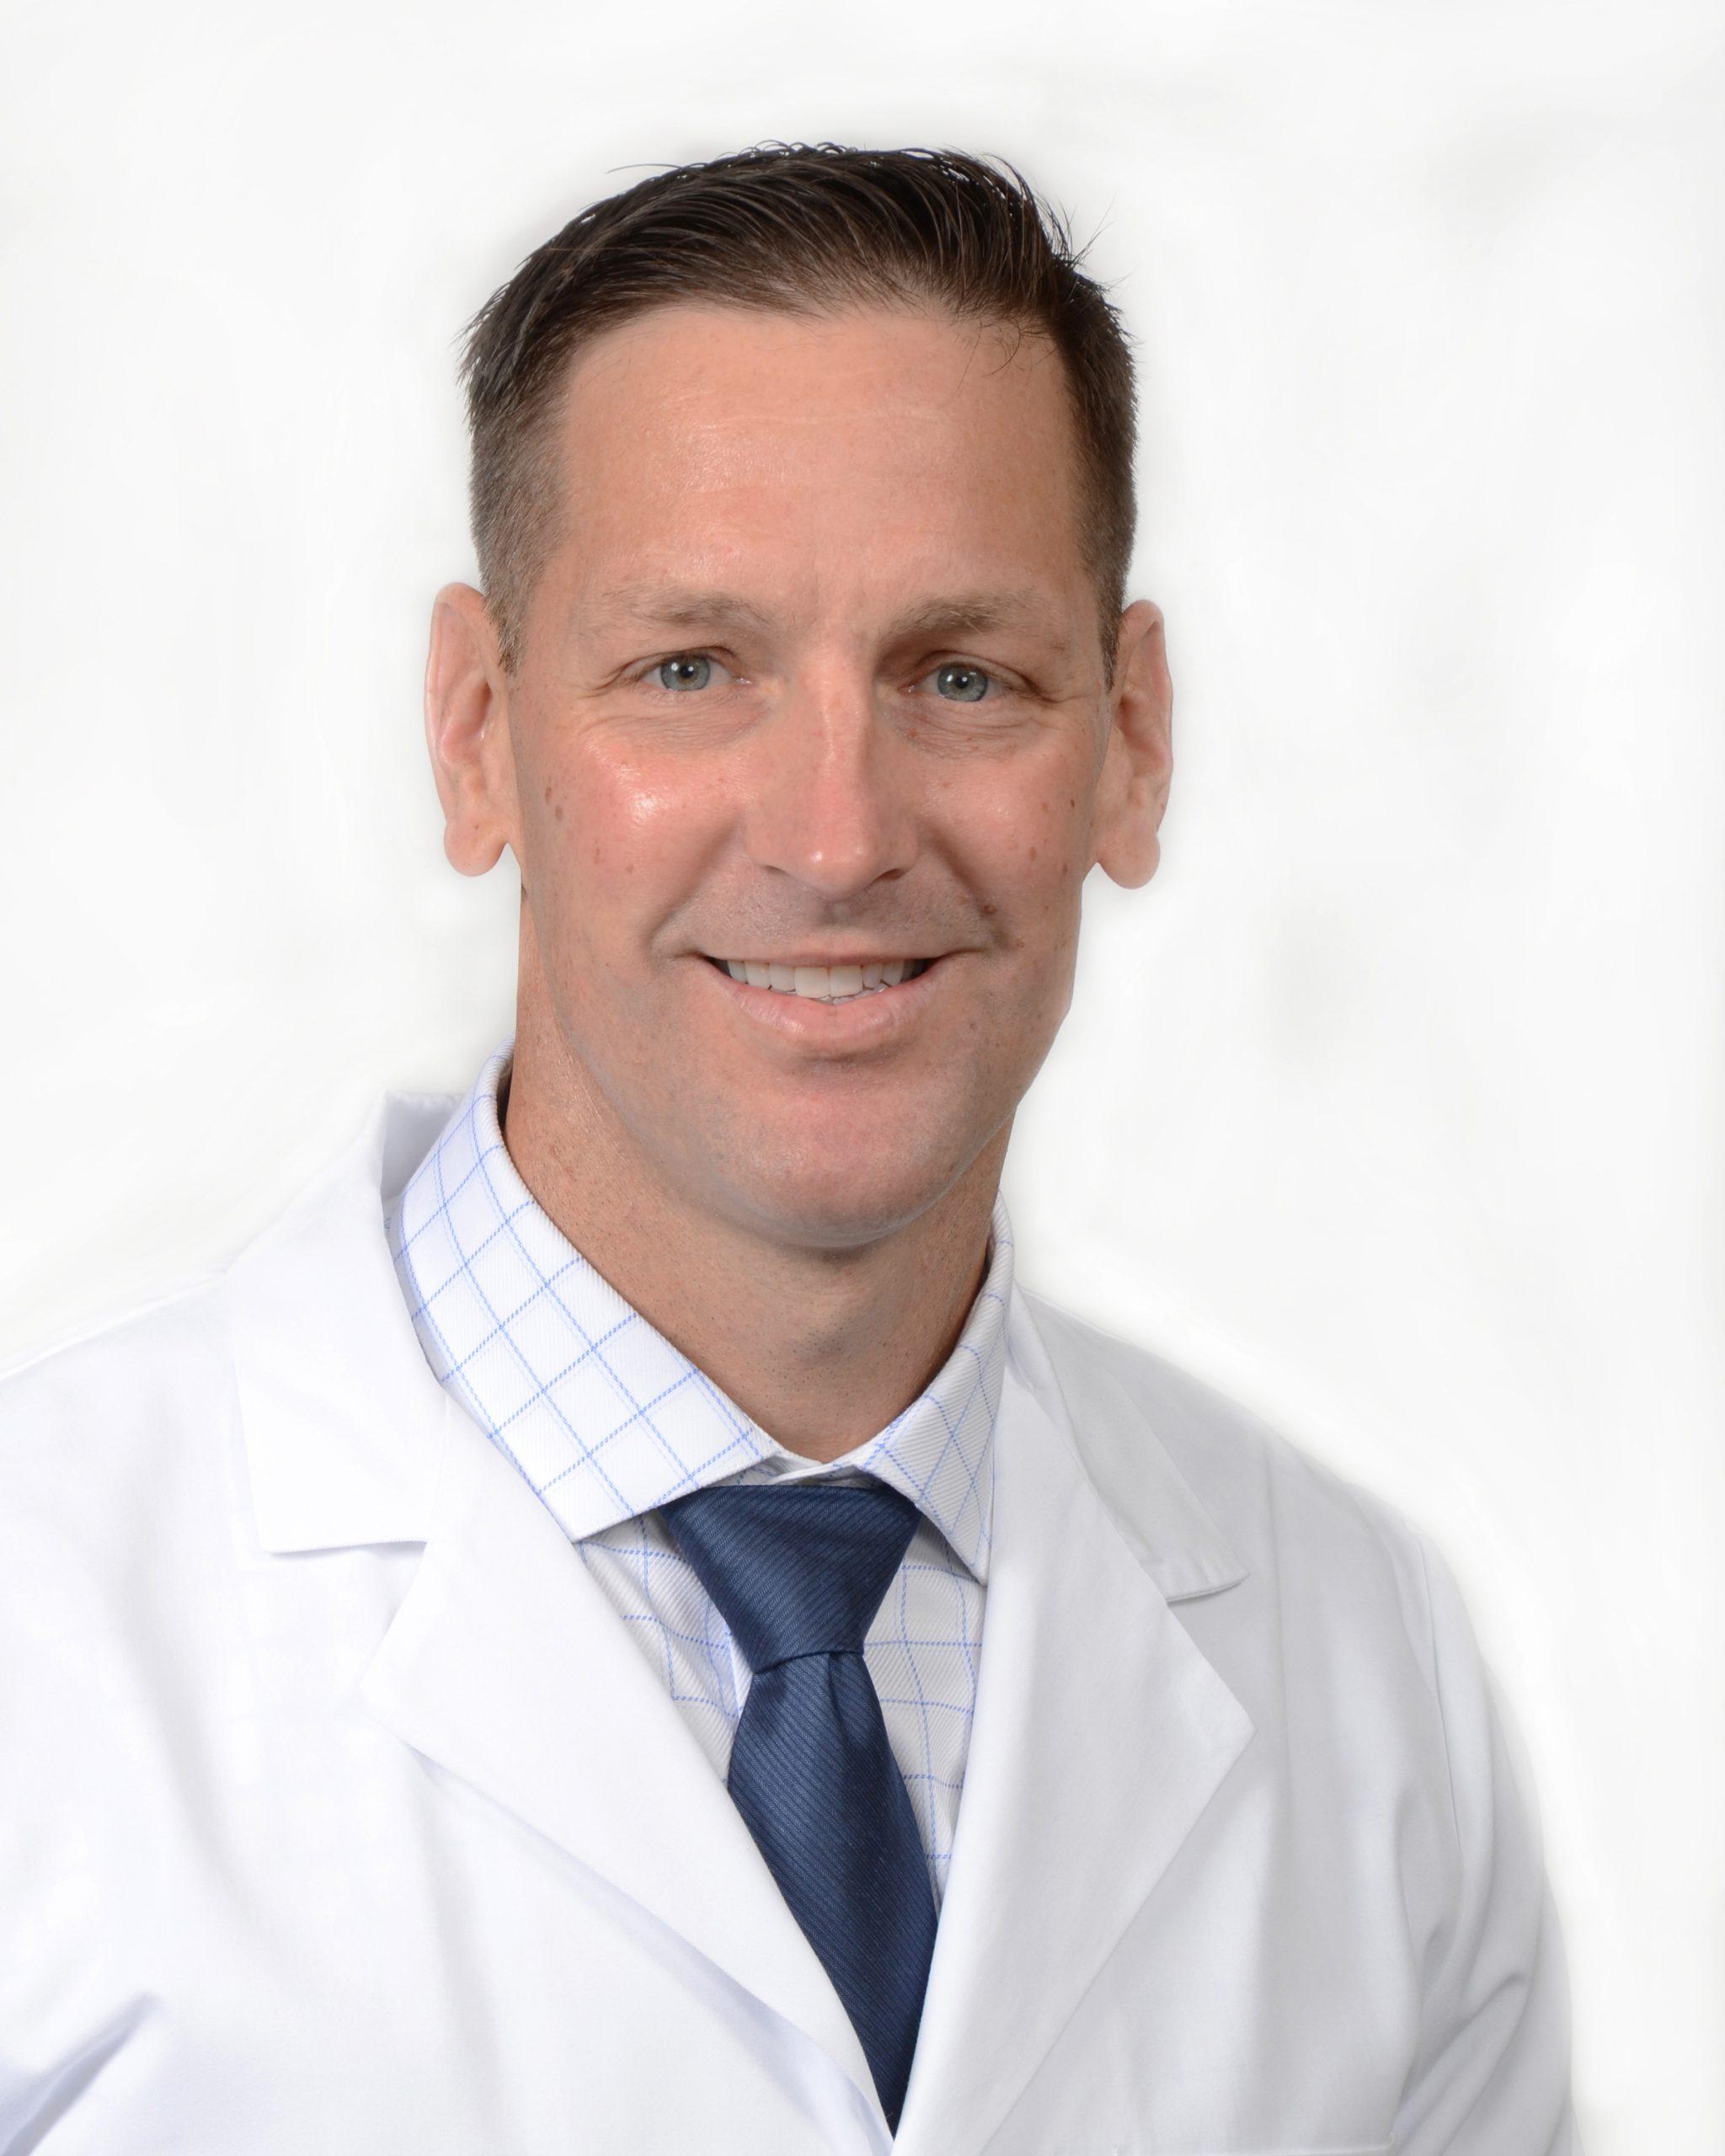 Chad Cole Orthopaedic Surgery